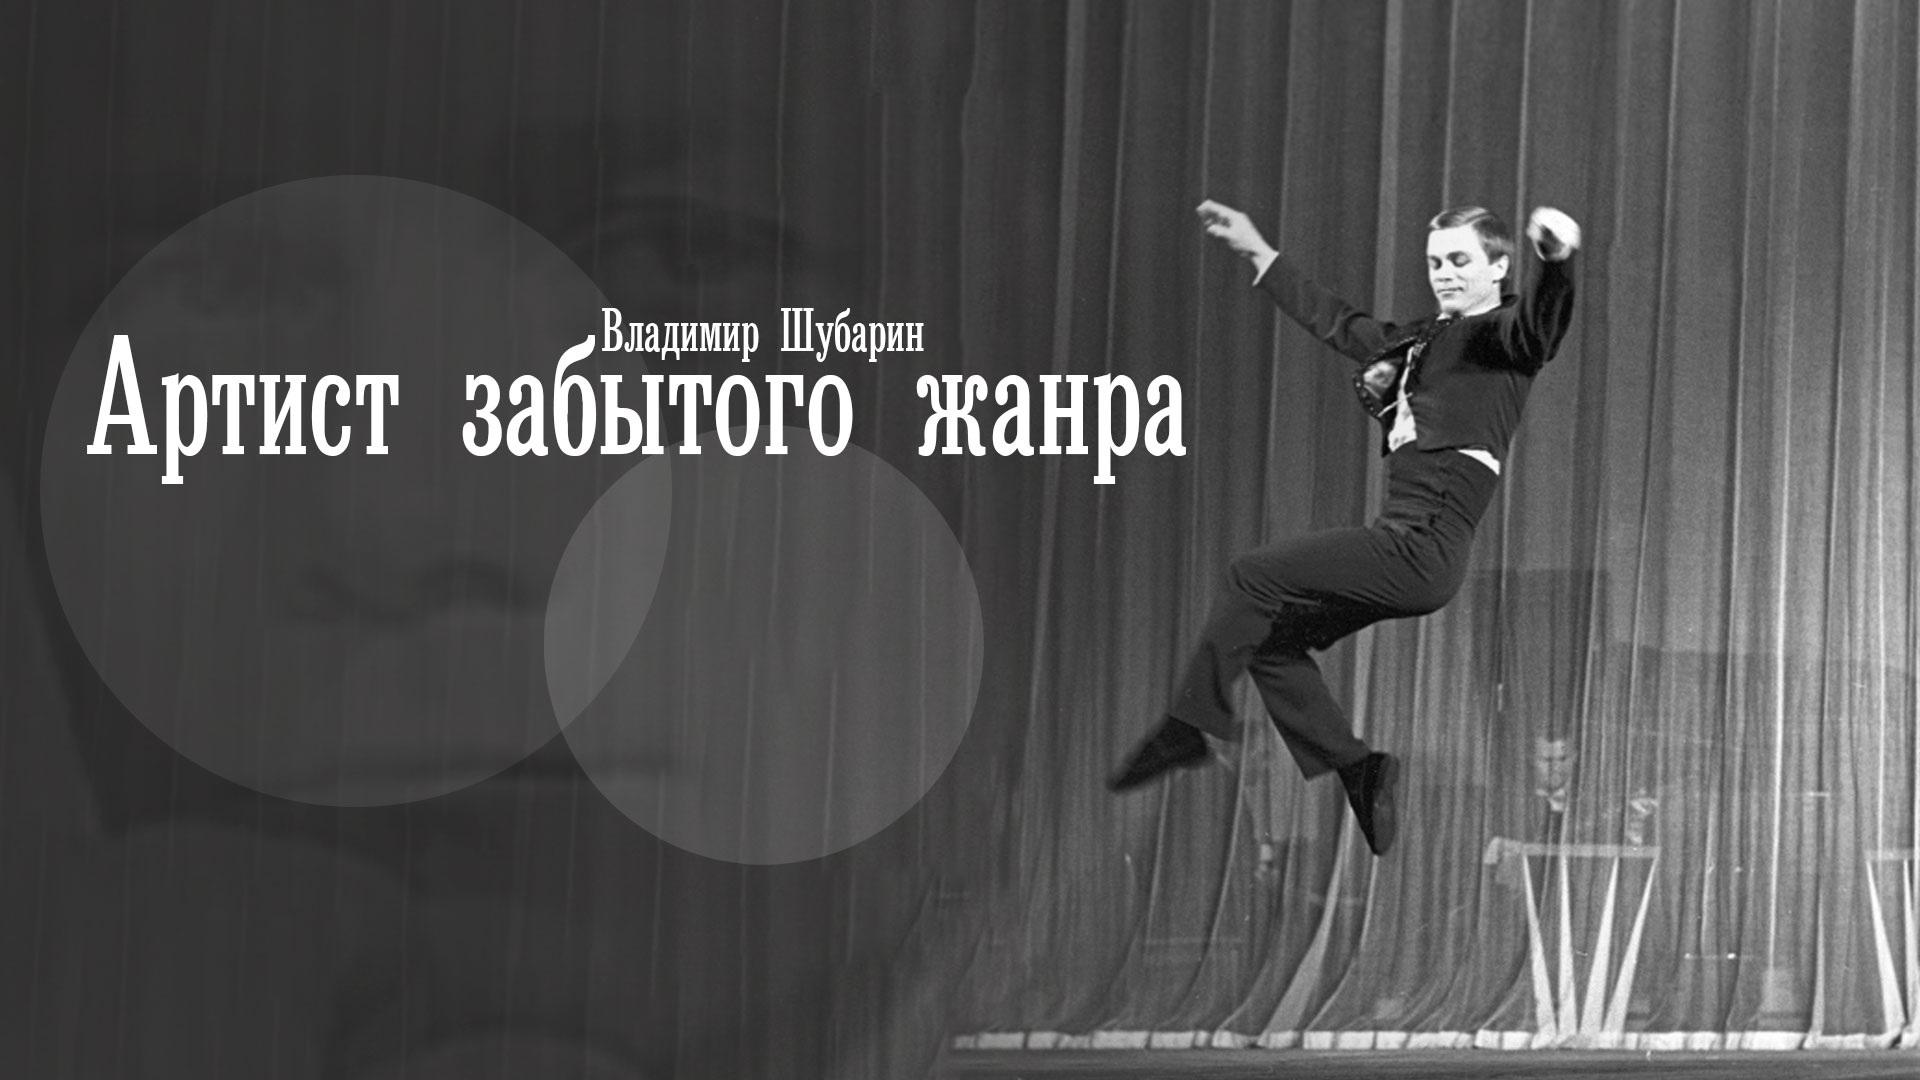 Артист забытого жанра. Владимир Шубарин